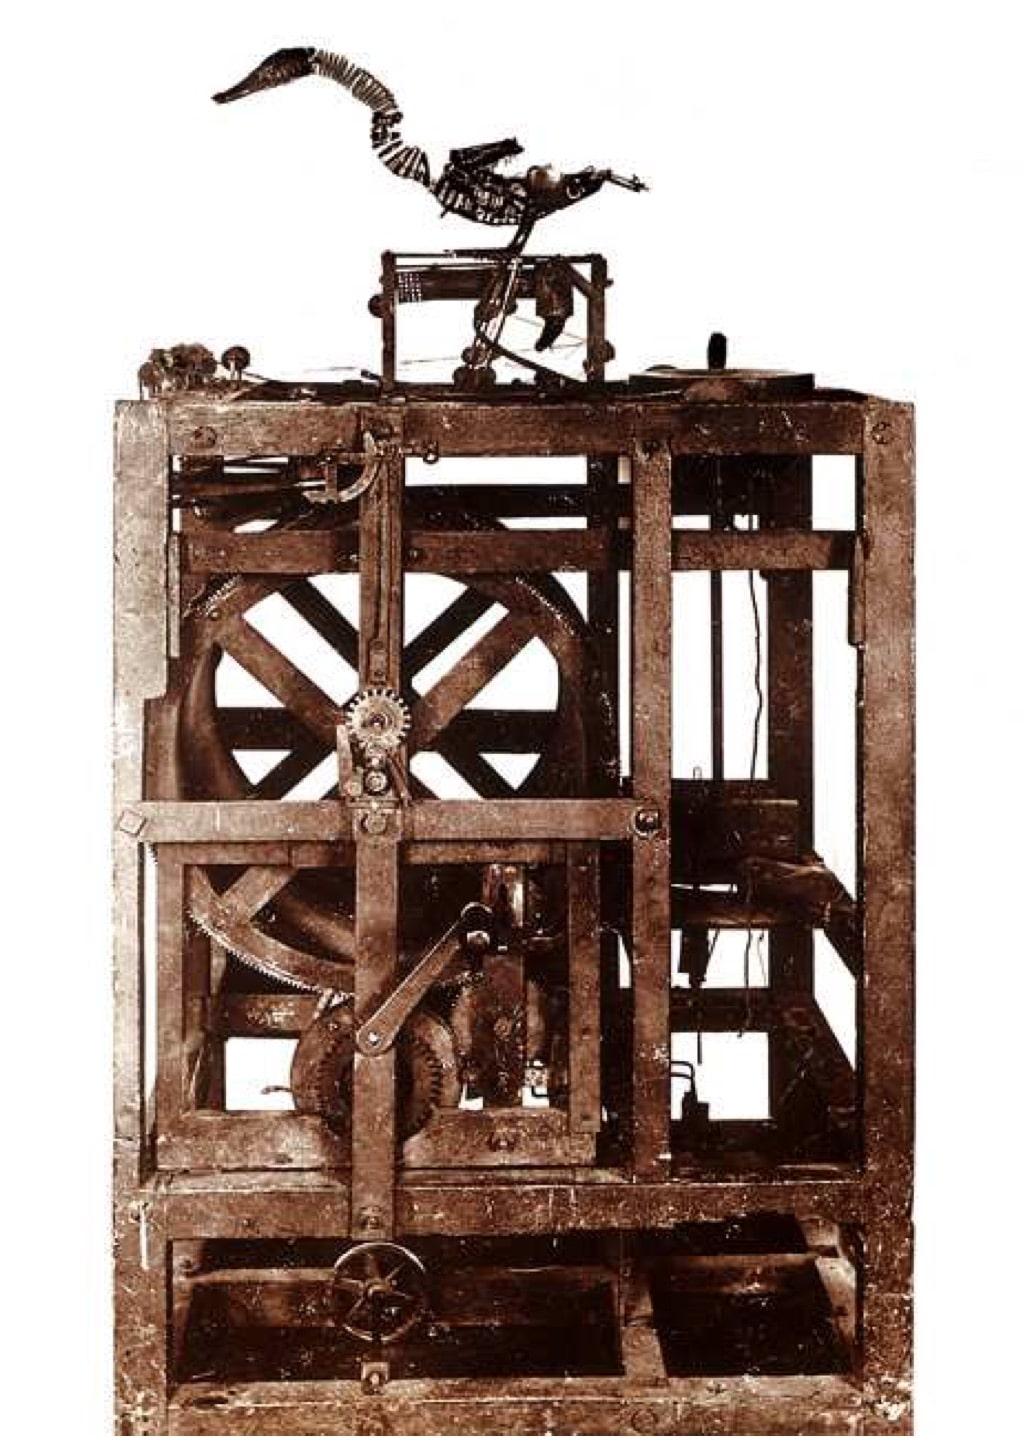 automate-canard-vaucanson-histoire